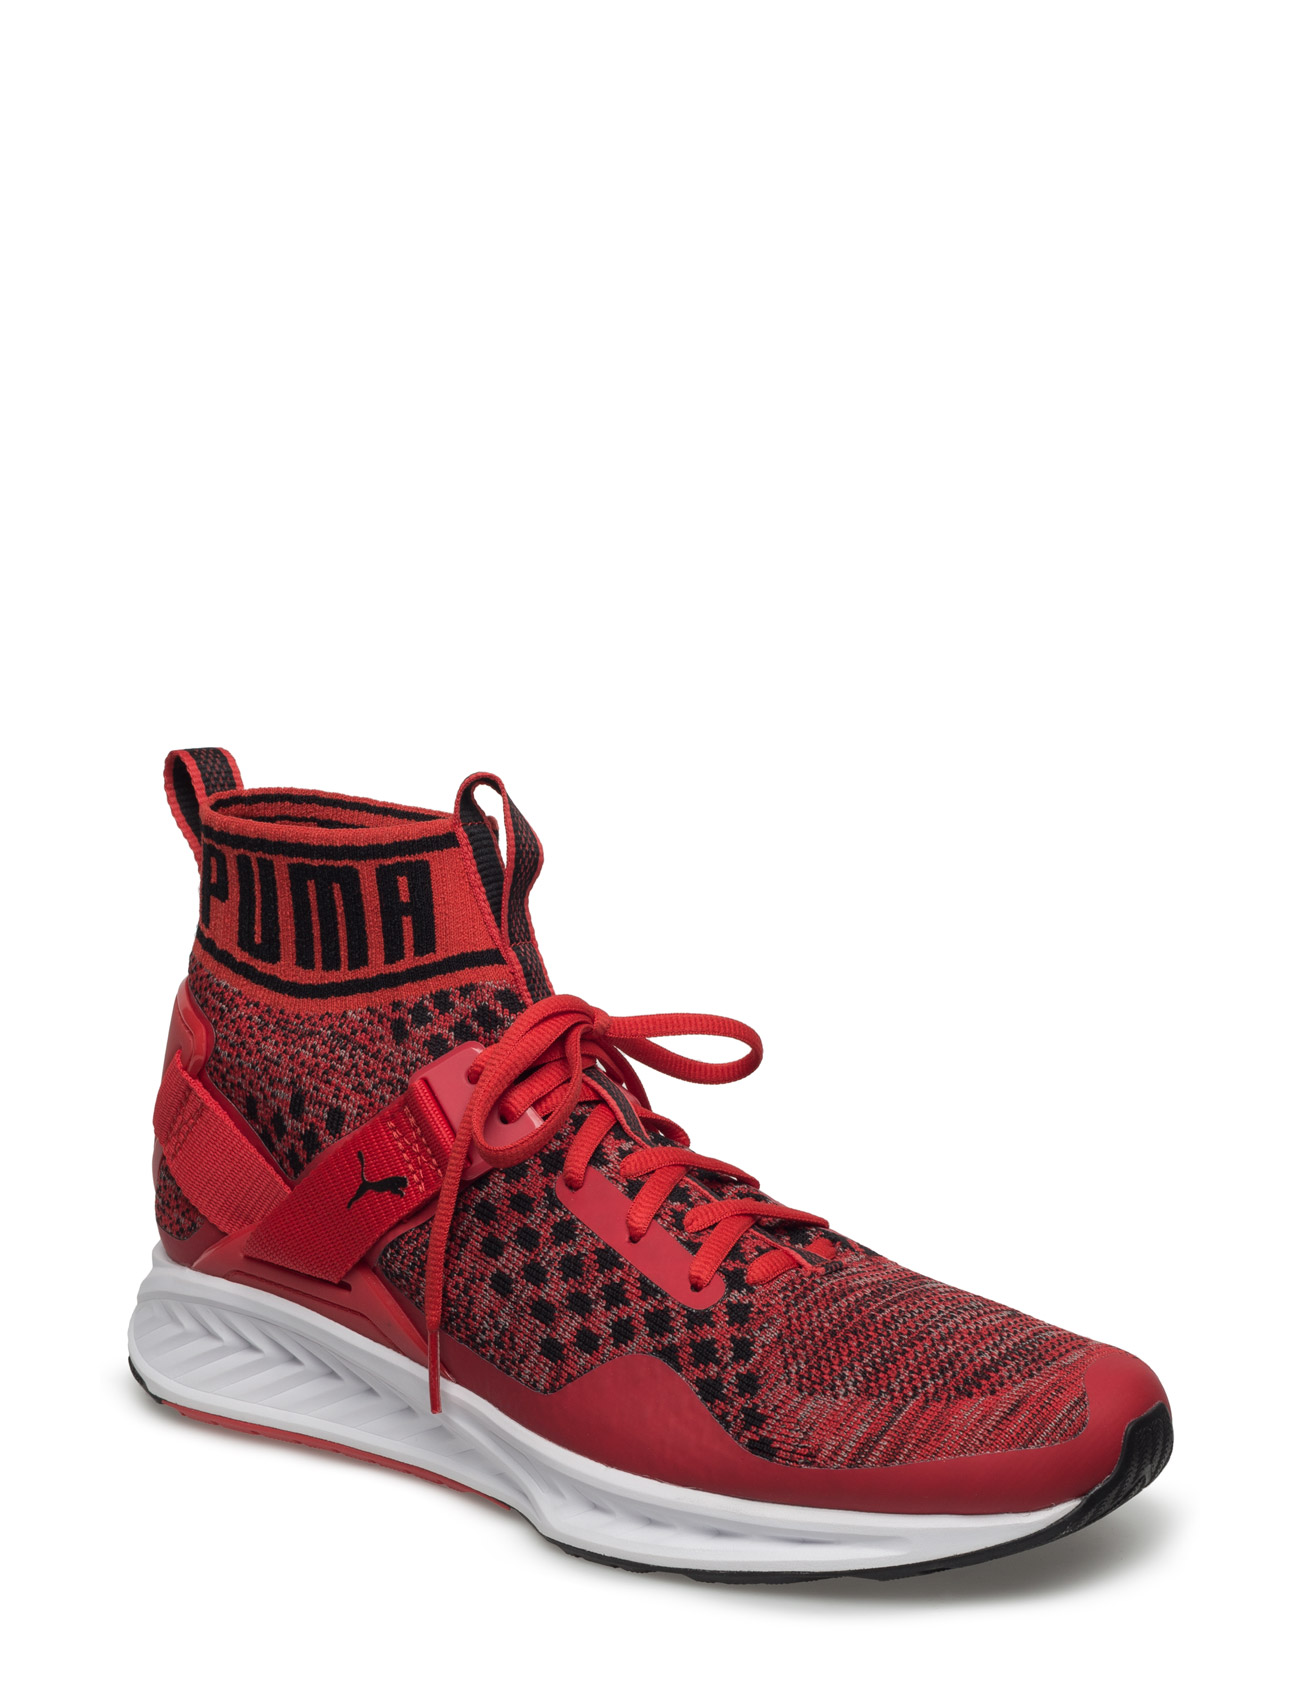 Ignite Evoknit PUMA SPORT Sports sko til Herrer i